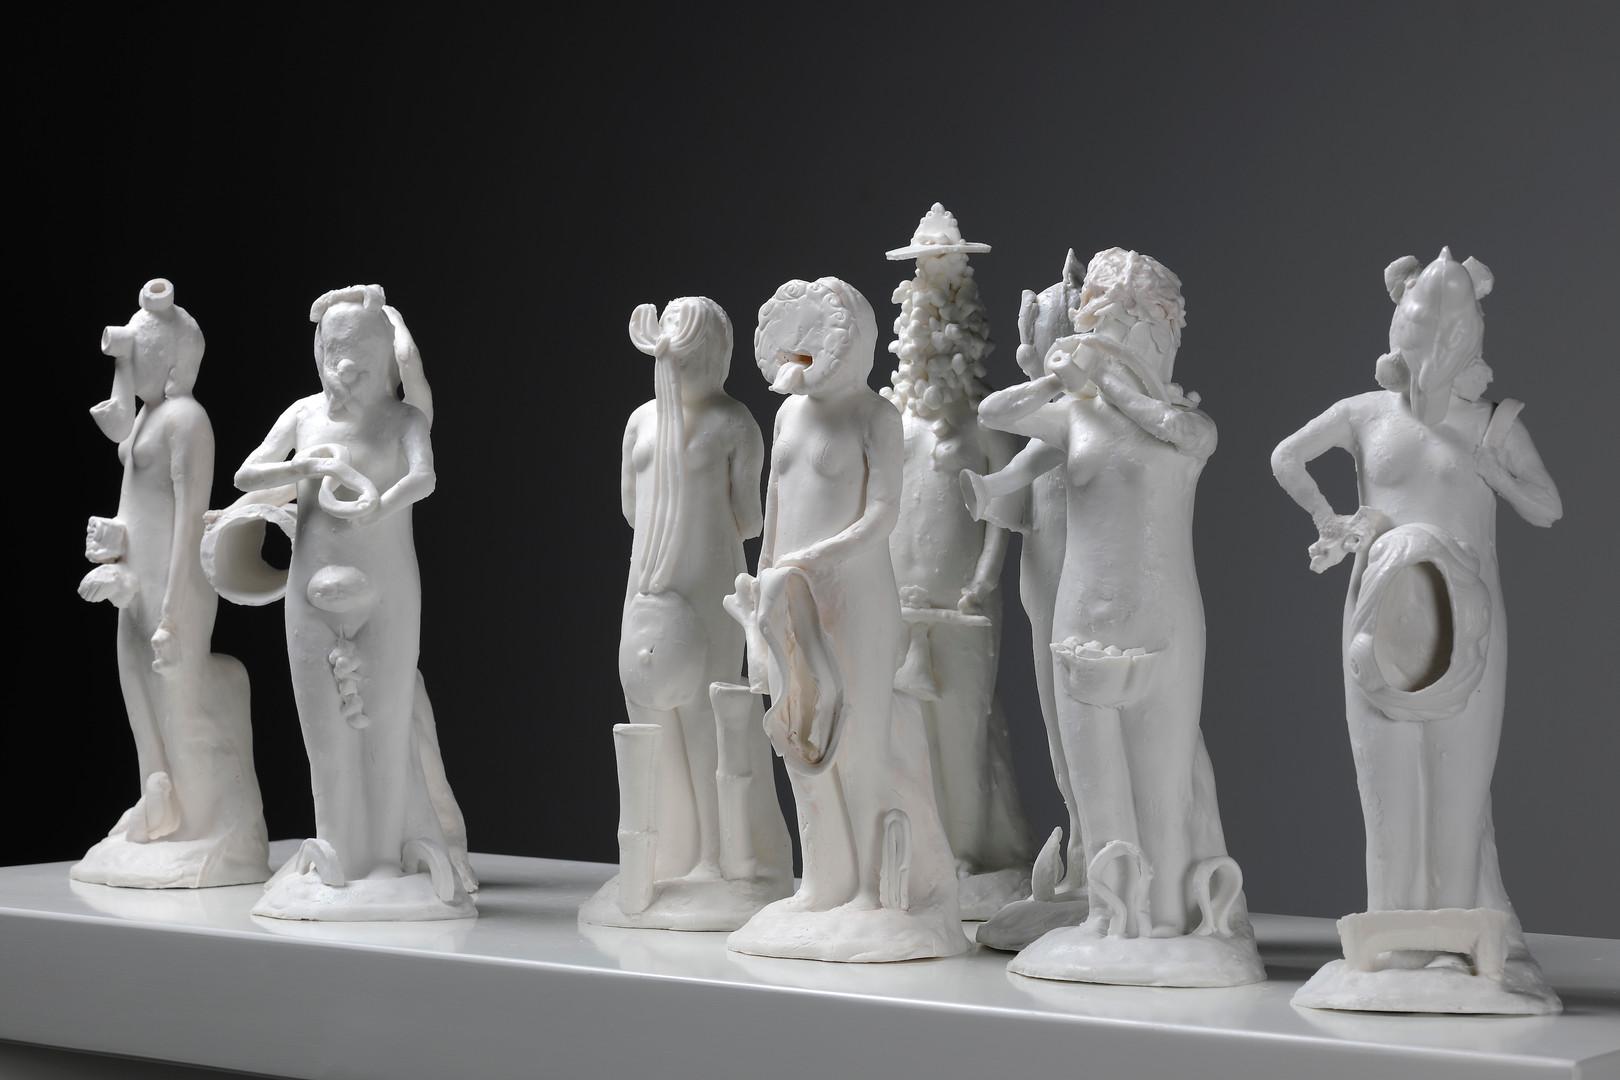 Neuf neures déesses (view_2)